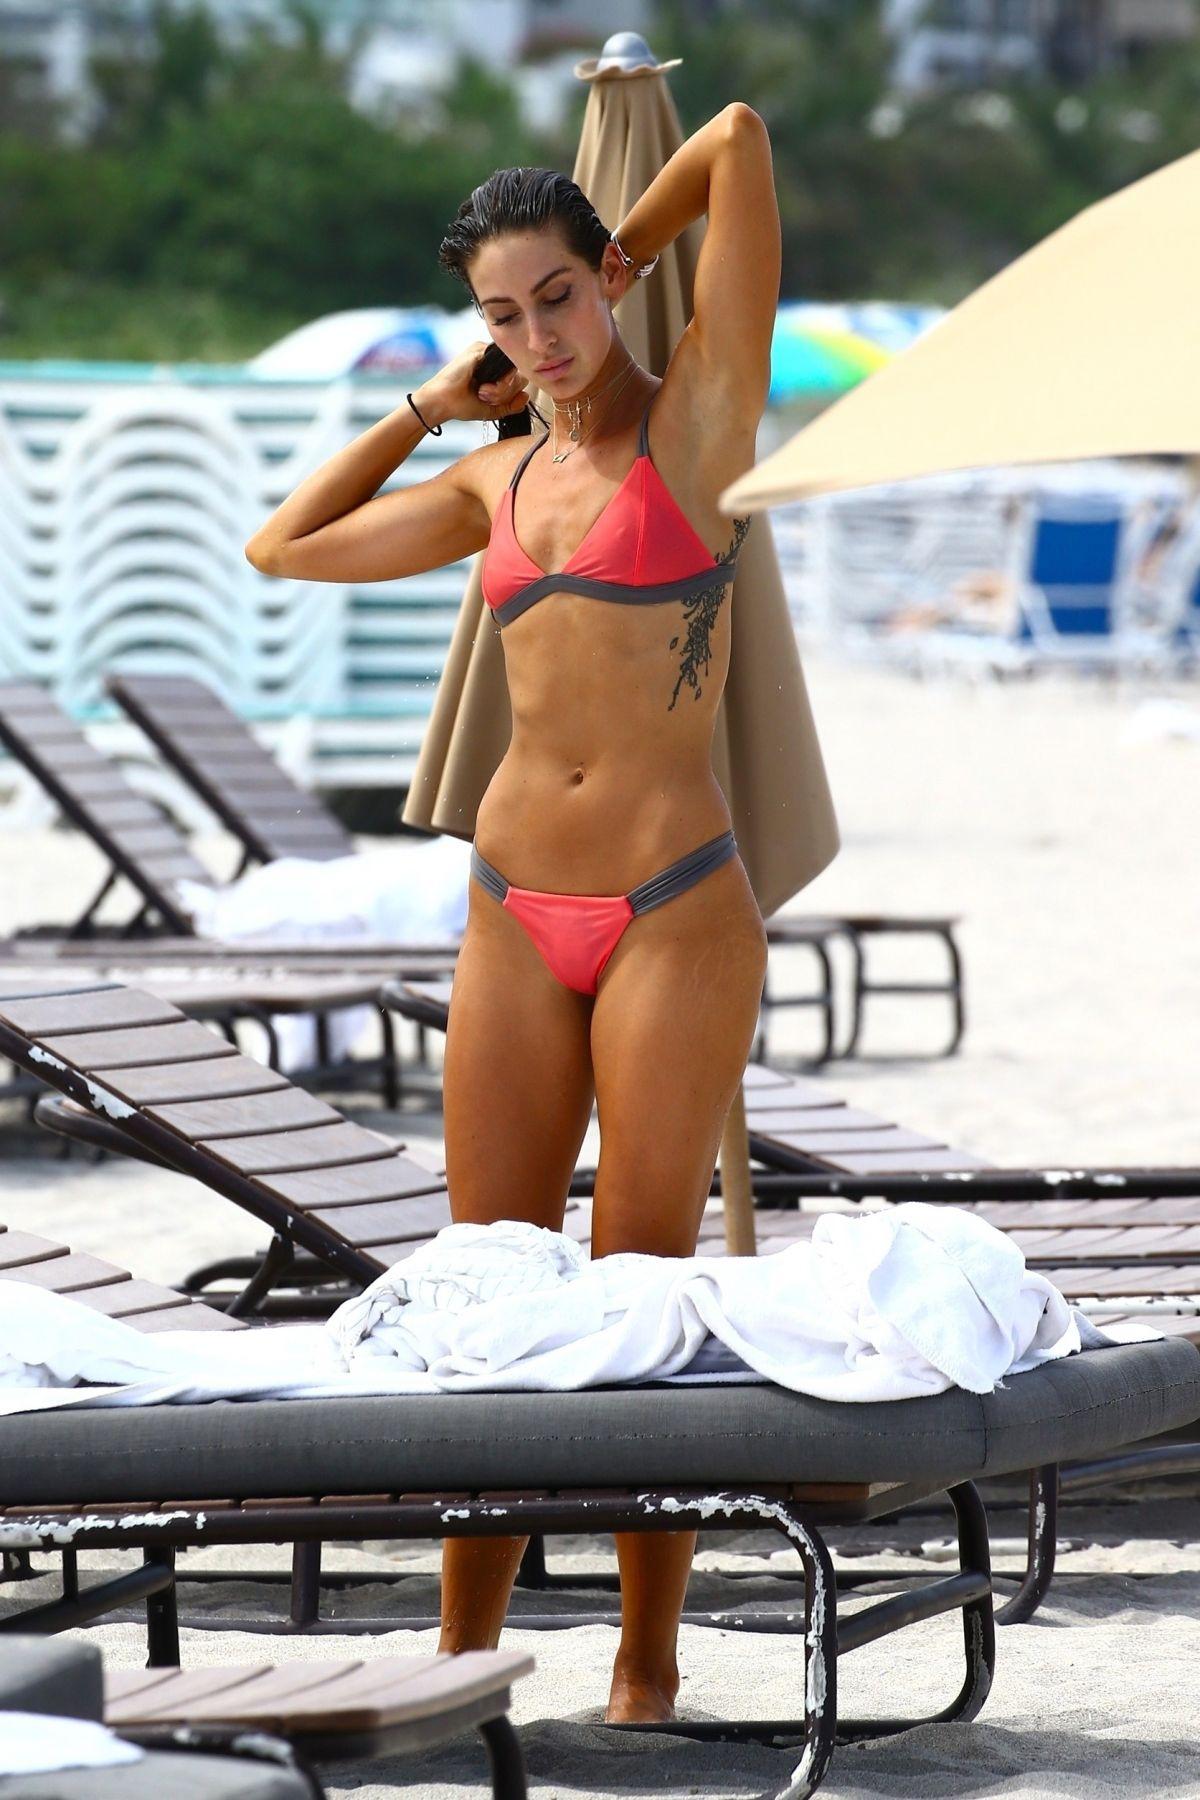 Bikini Kaylee Ricciardi nudes (17 foto and video), Pussy, Is a cute, Instagram, in bikini 2018